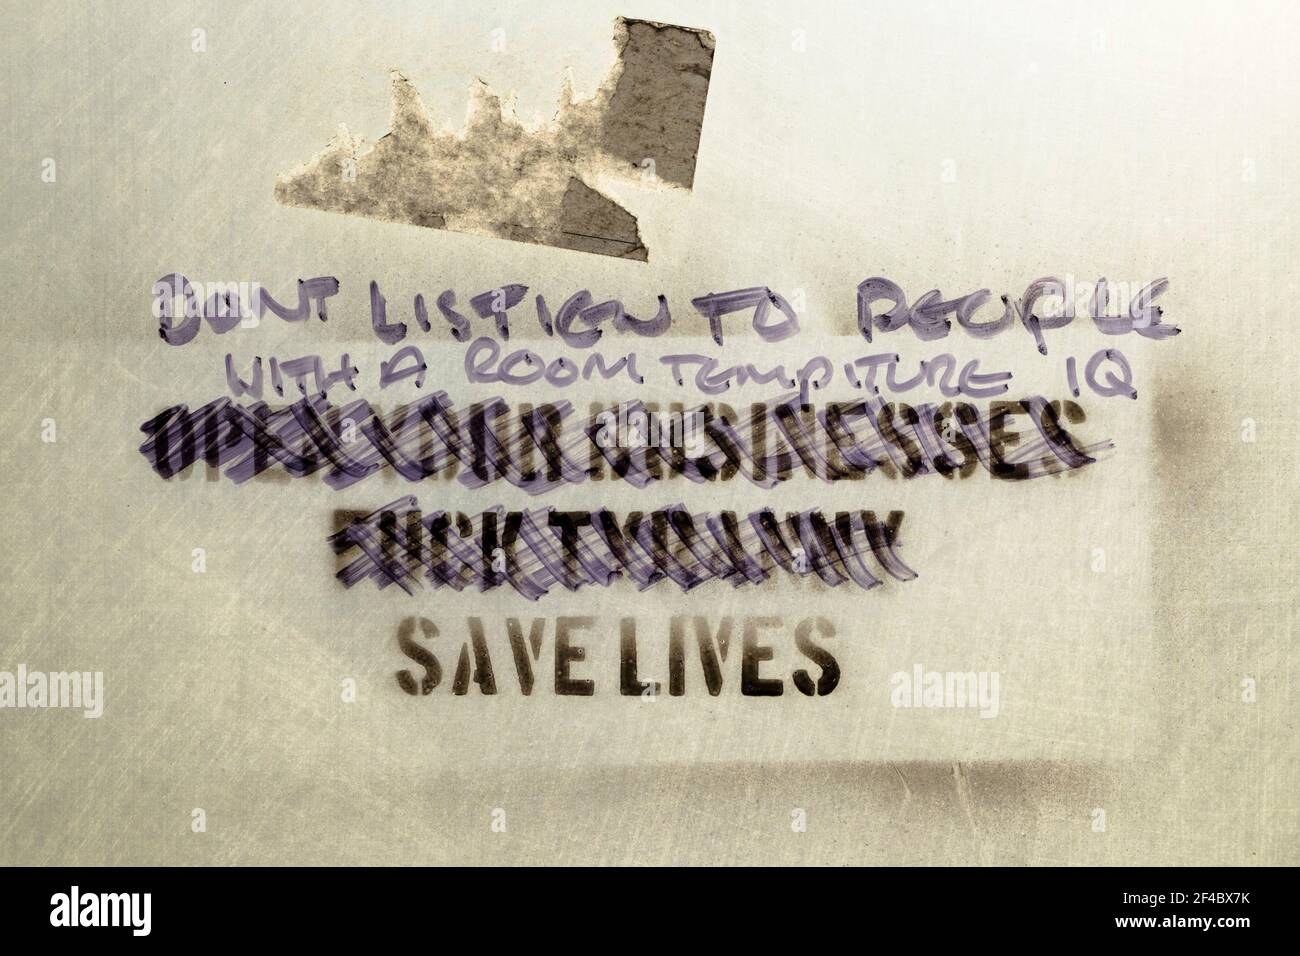 amended-anti-lockdown-graffiti-stencil-o